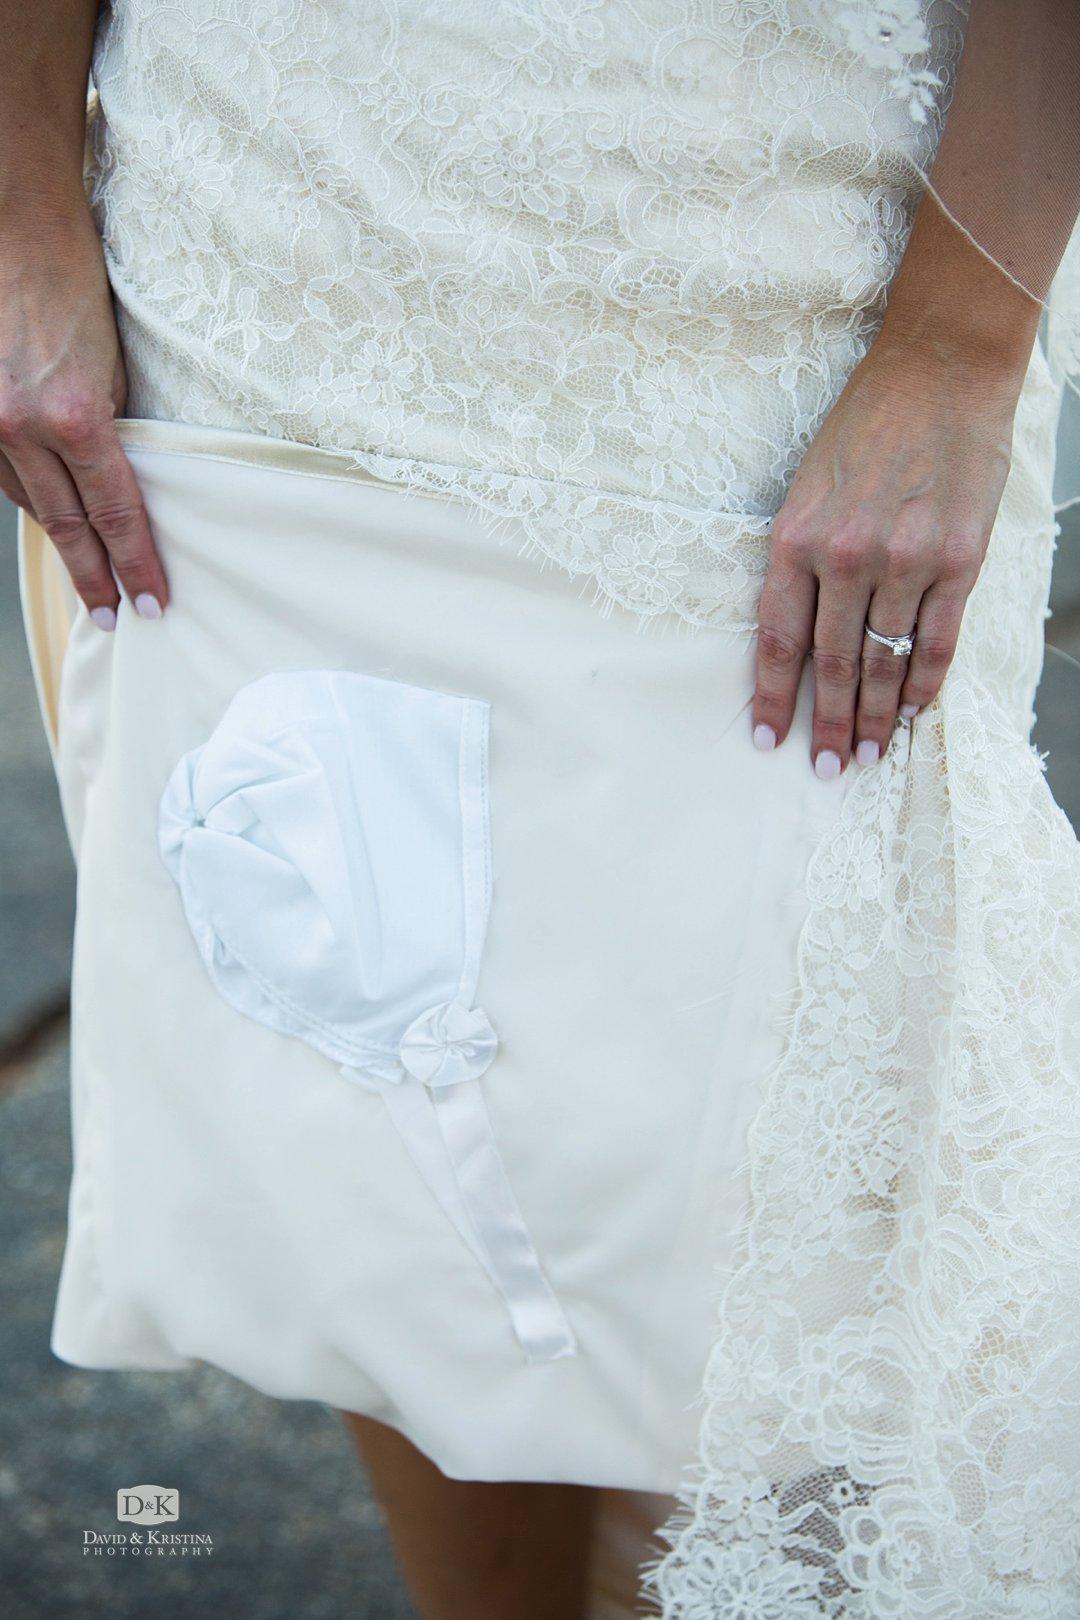 groom's baby bonnet sewn into bride's dress